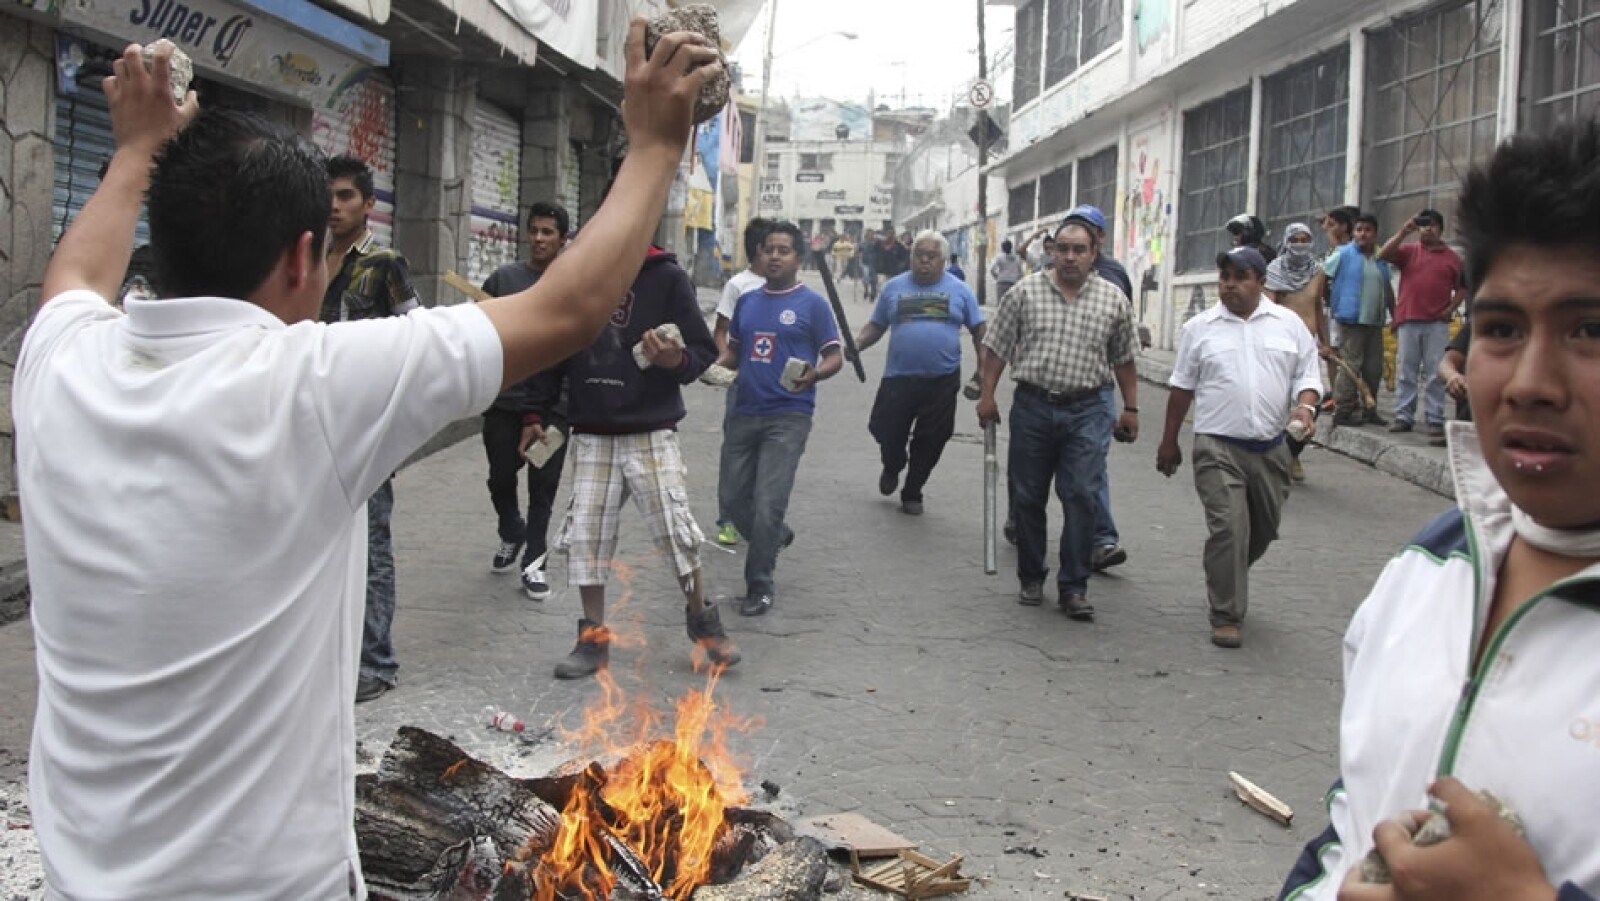 Según las autoridades, un grupo de inconformes comenzó a agredir a los policías